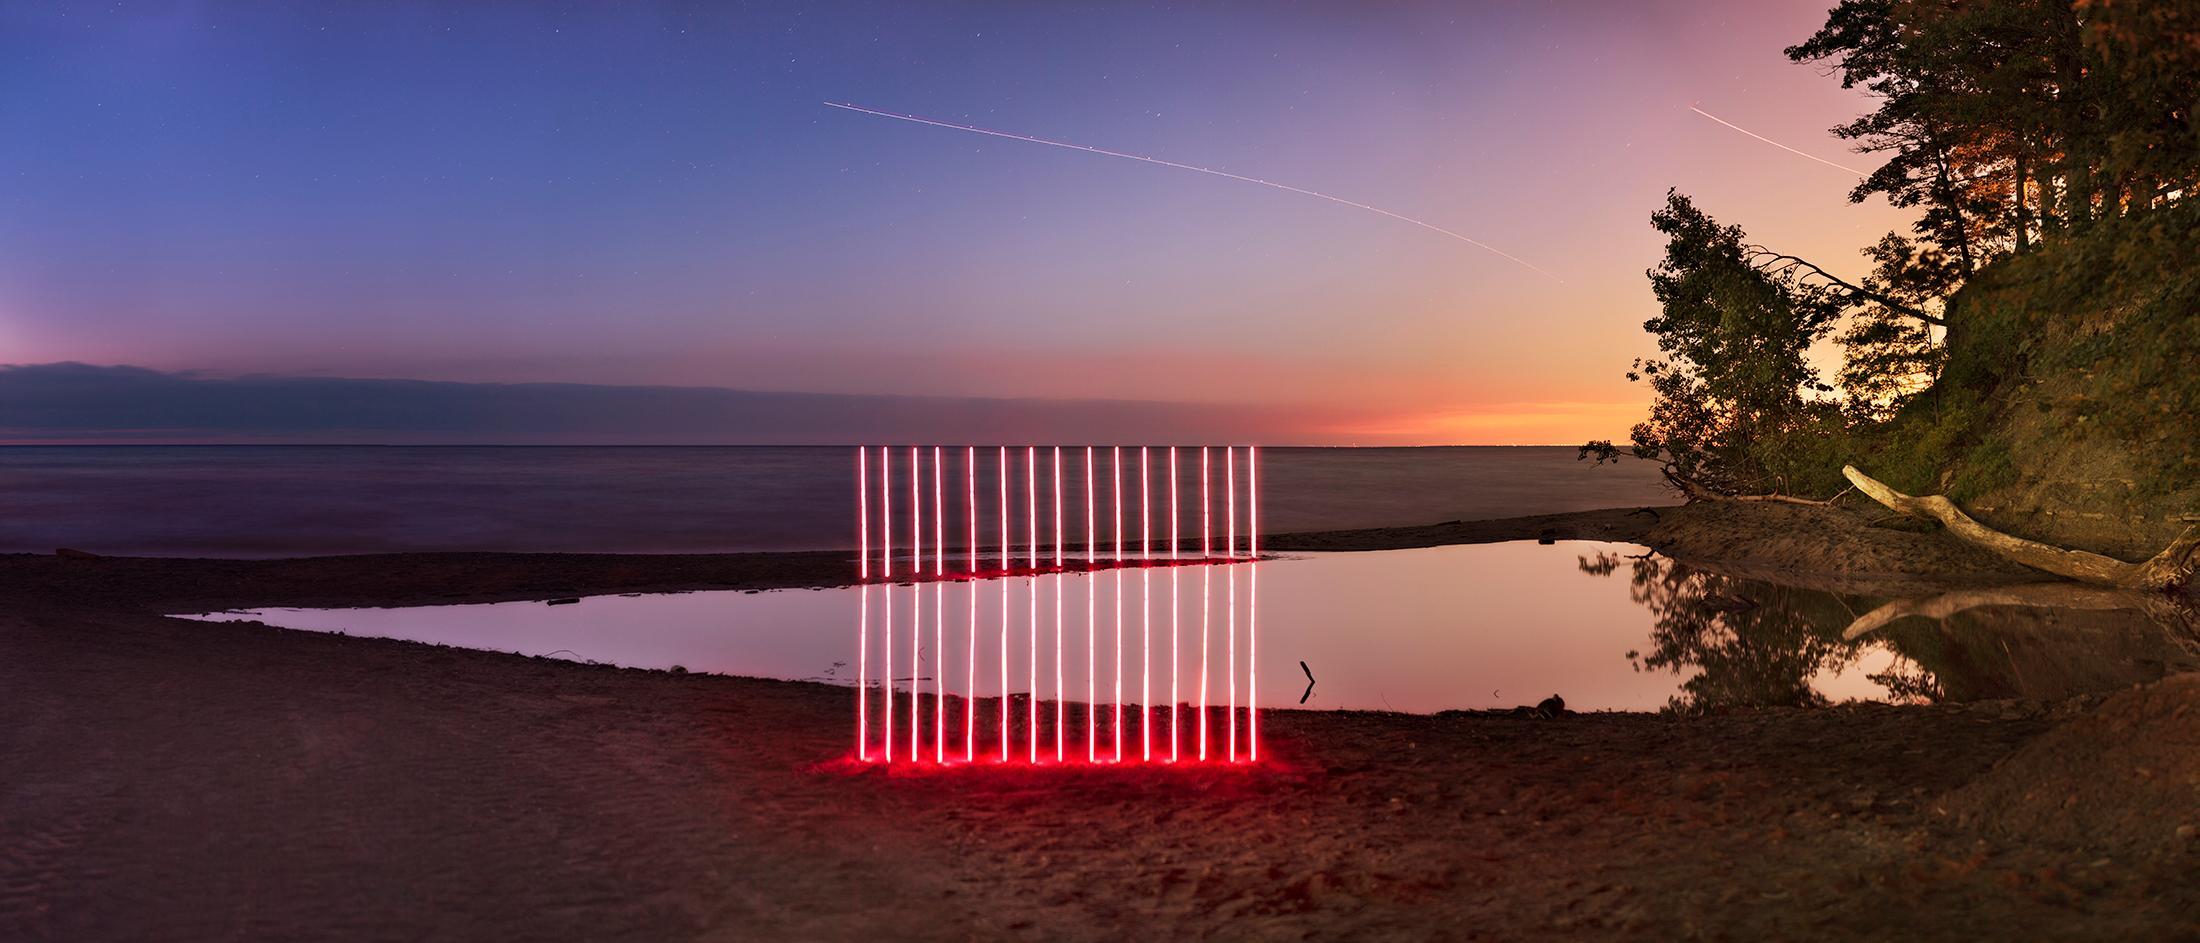 Landscape, Nature, Trees, Water, Light, Huntington Beach,